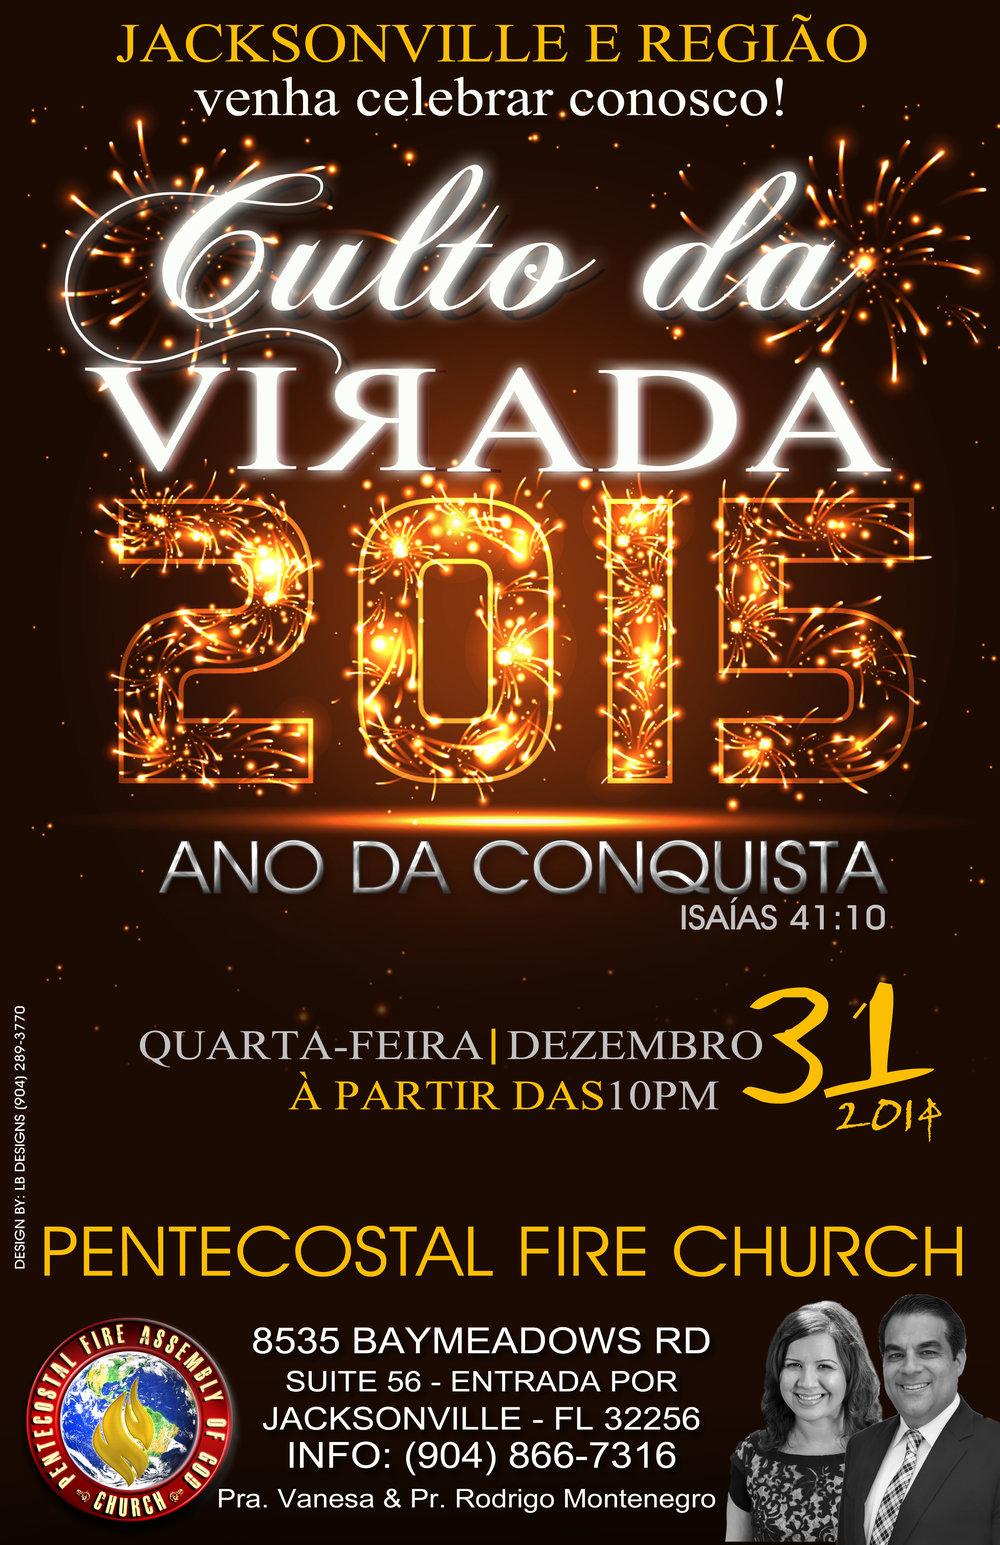 CultoDaVirada2015.jpg